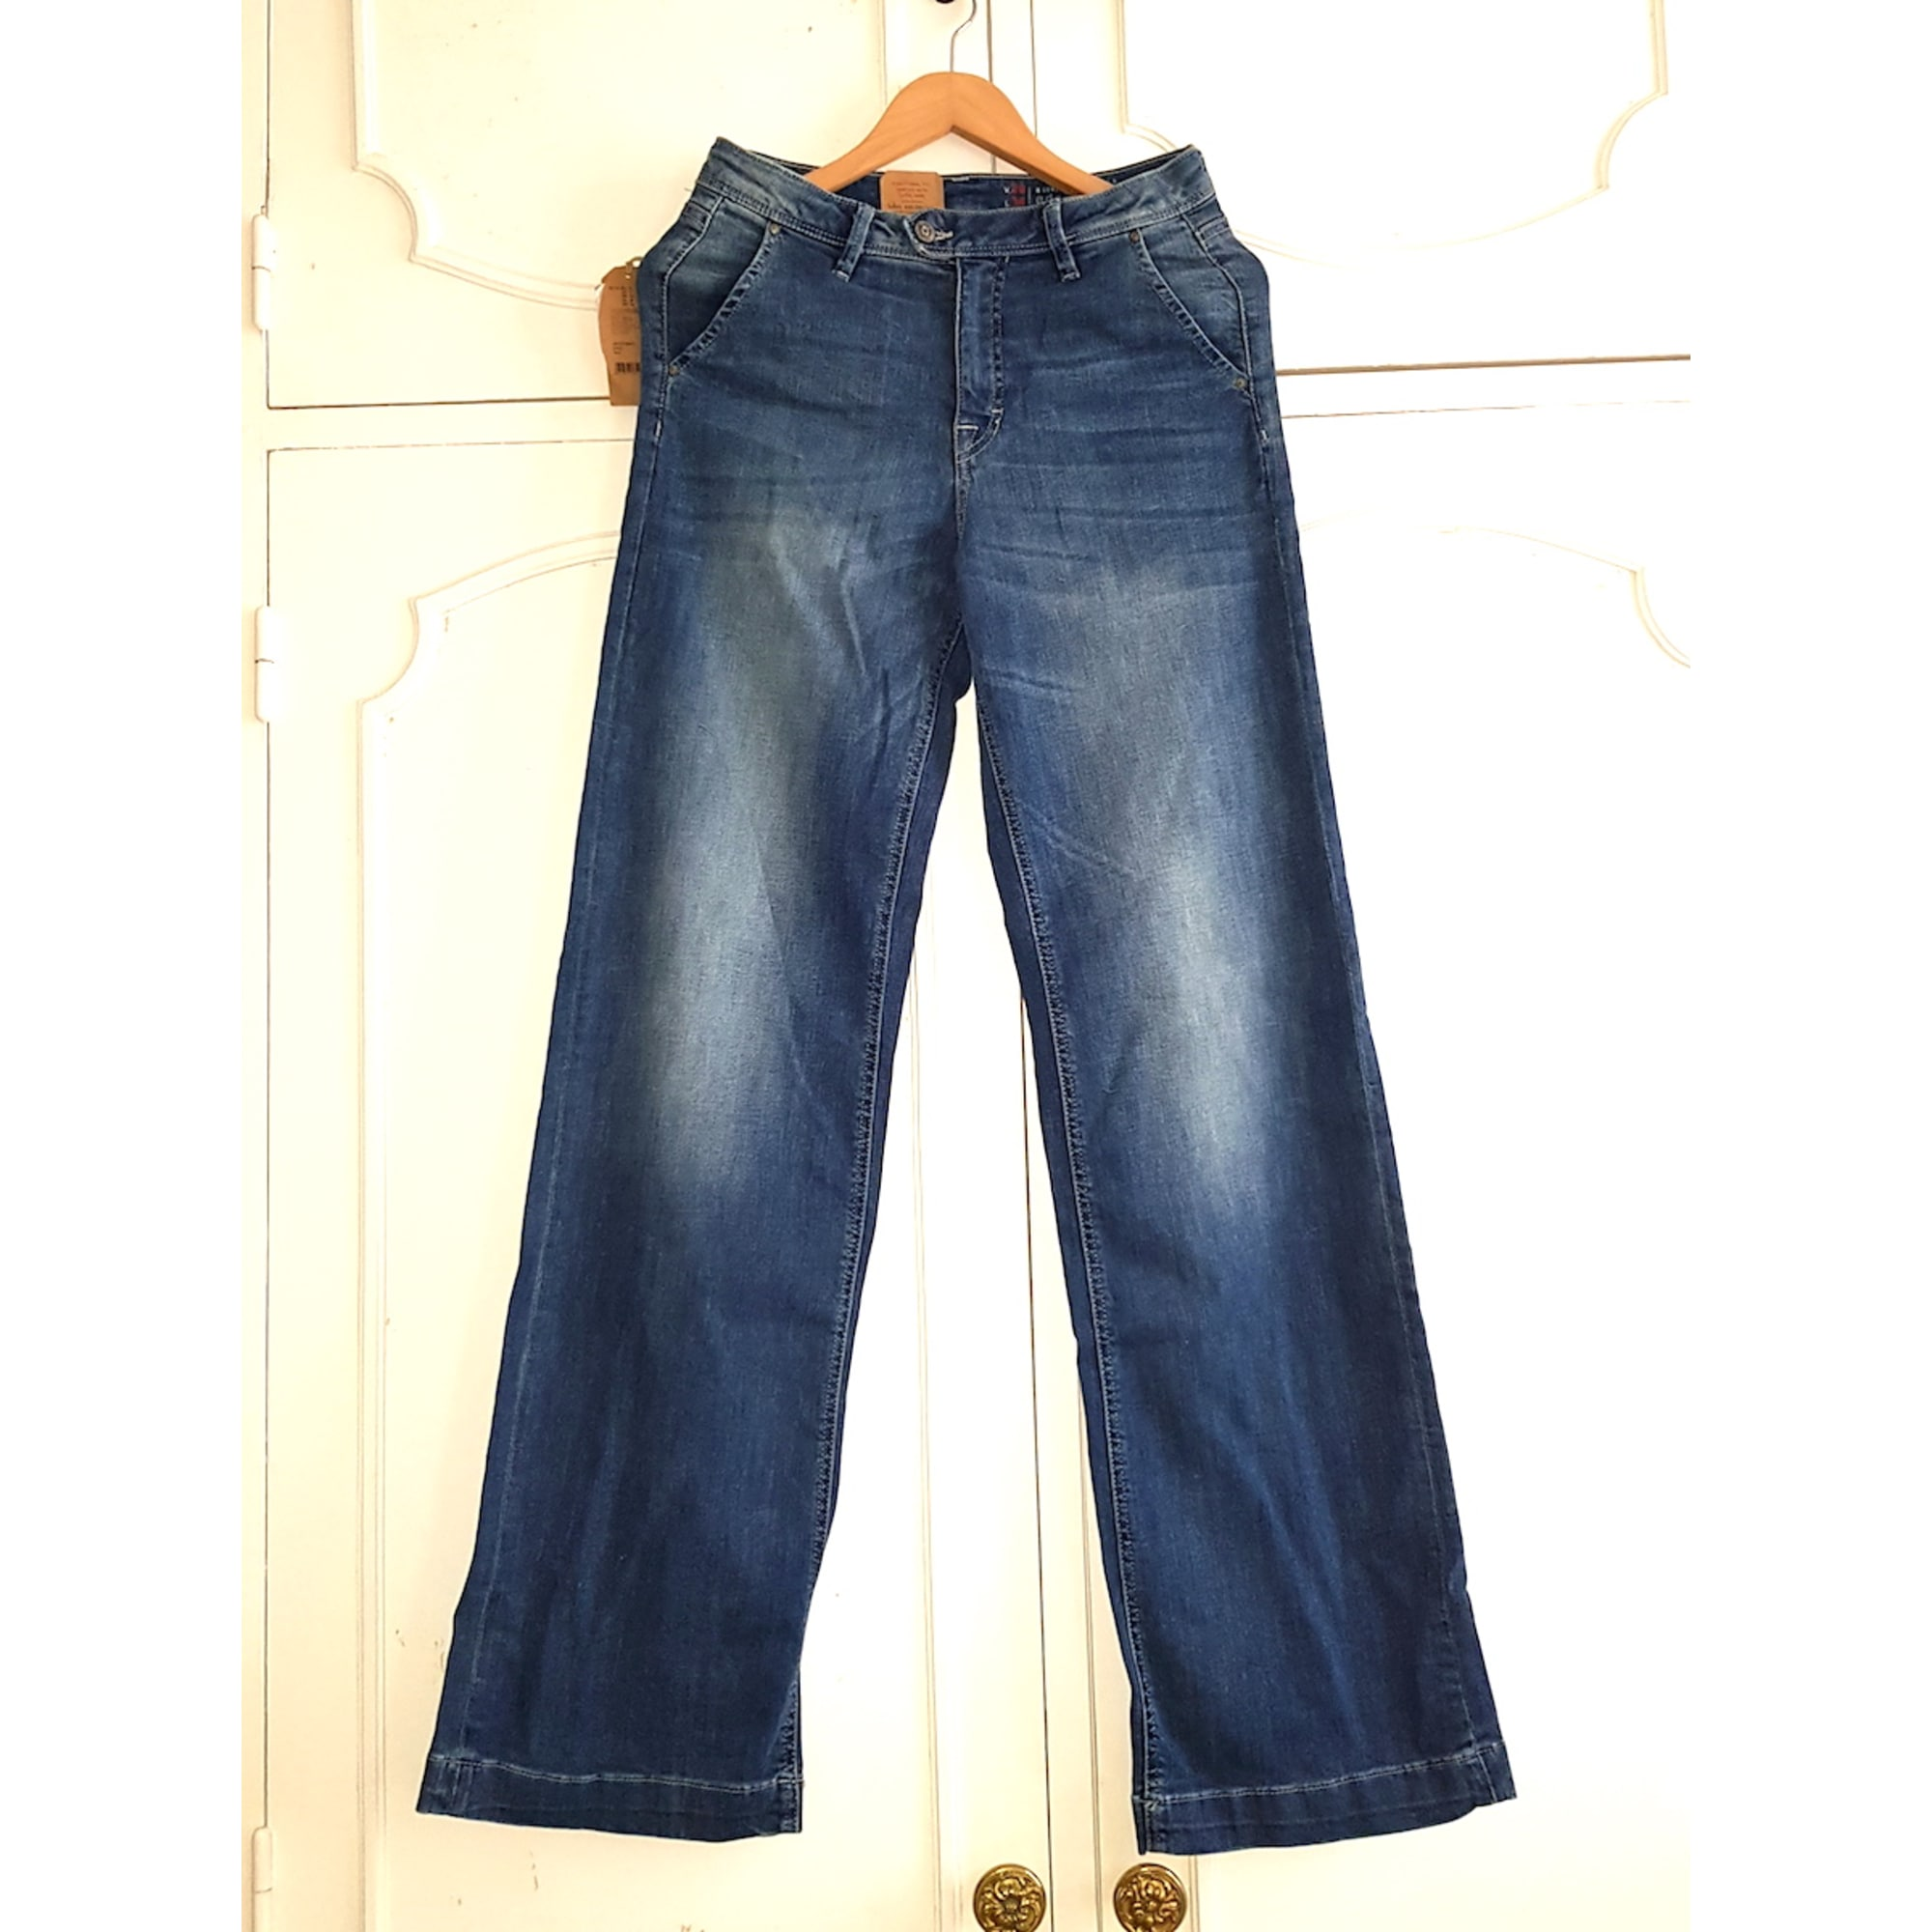 18839d845e4 Jeans évasé, boot-cut EDC BY ESPRIT Bleu, bleu marine, bleu turquoise